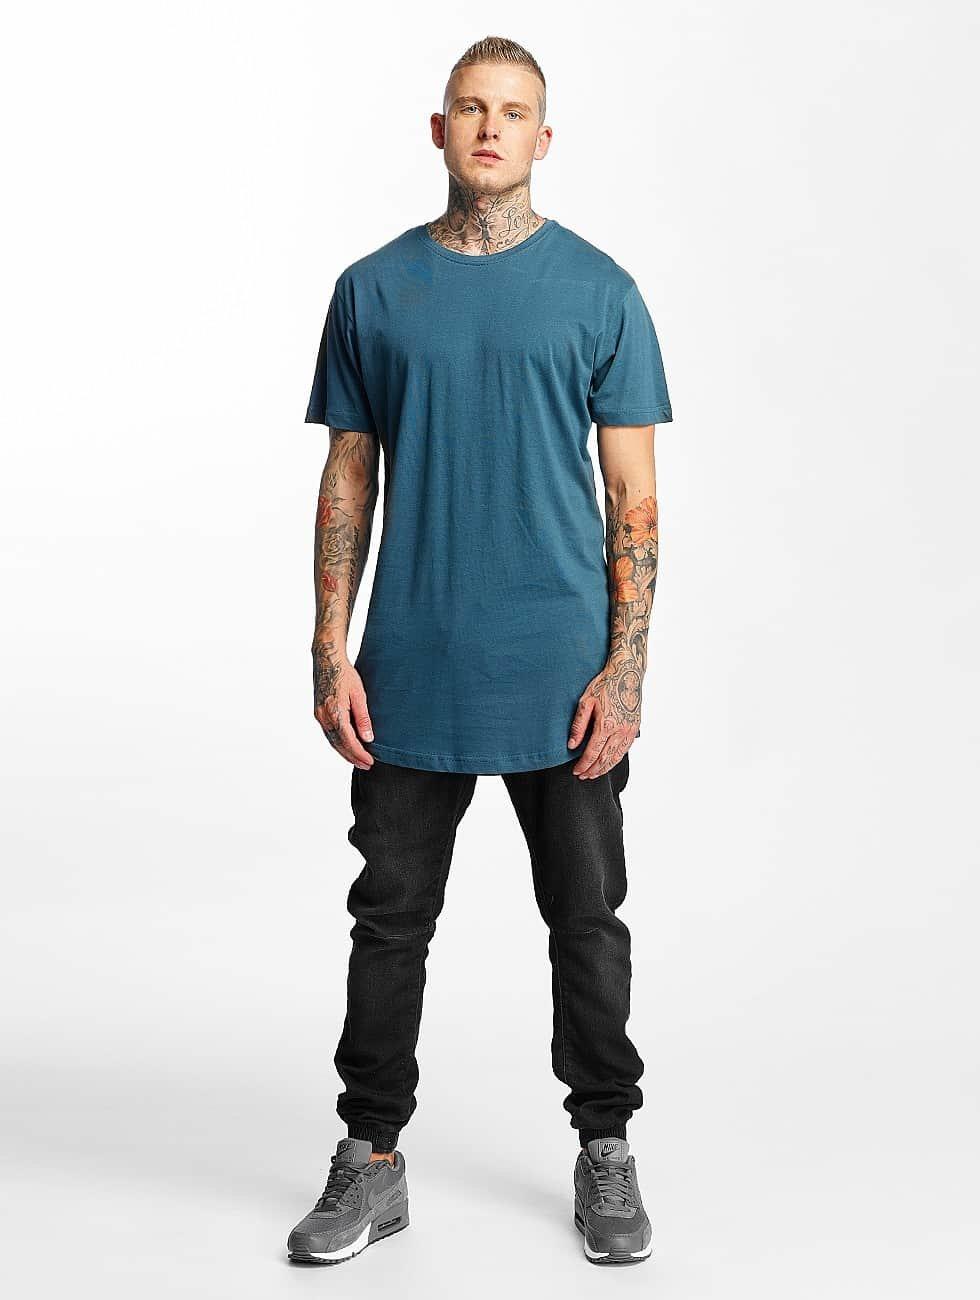 Urban Classics joggingbroek Knitted Denim zwart